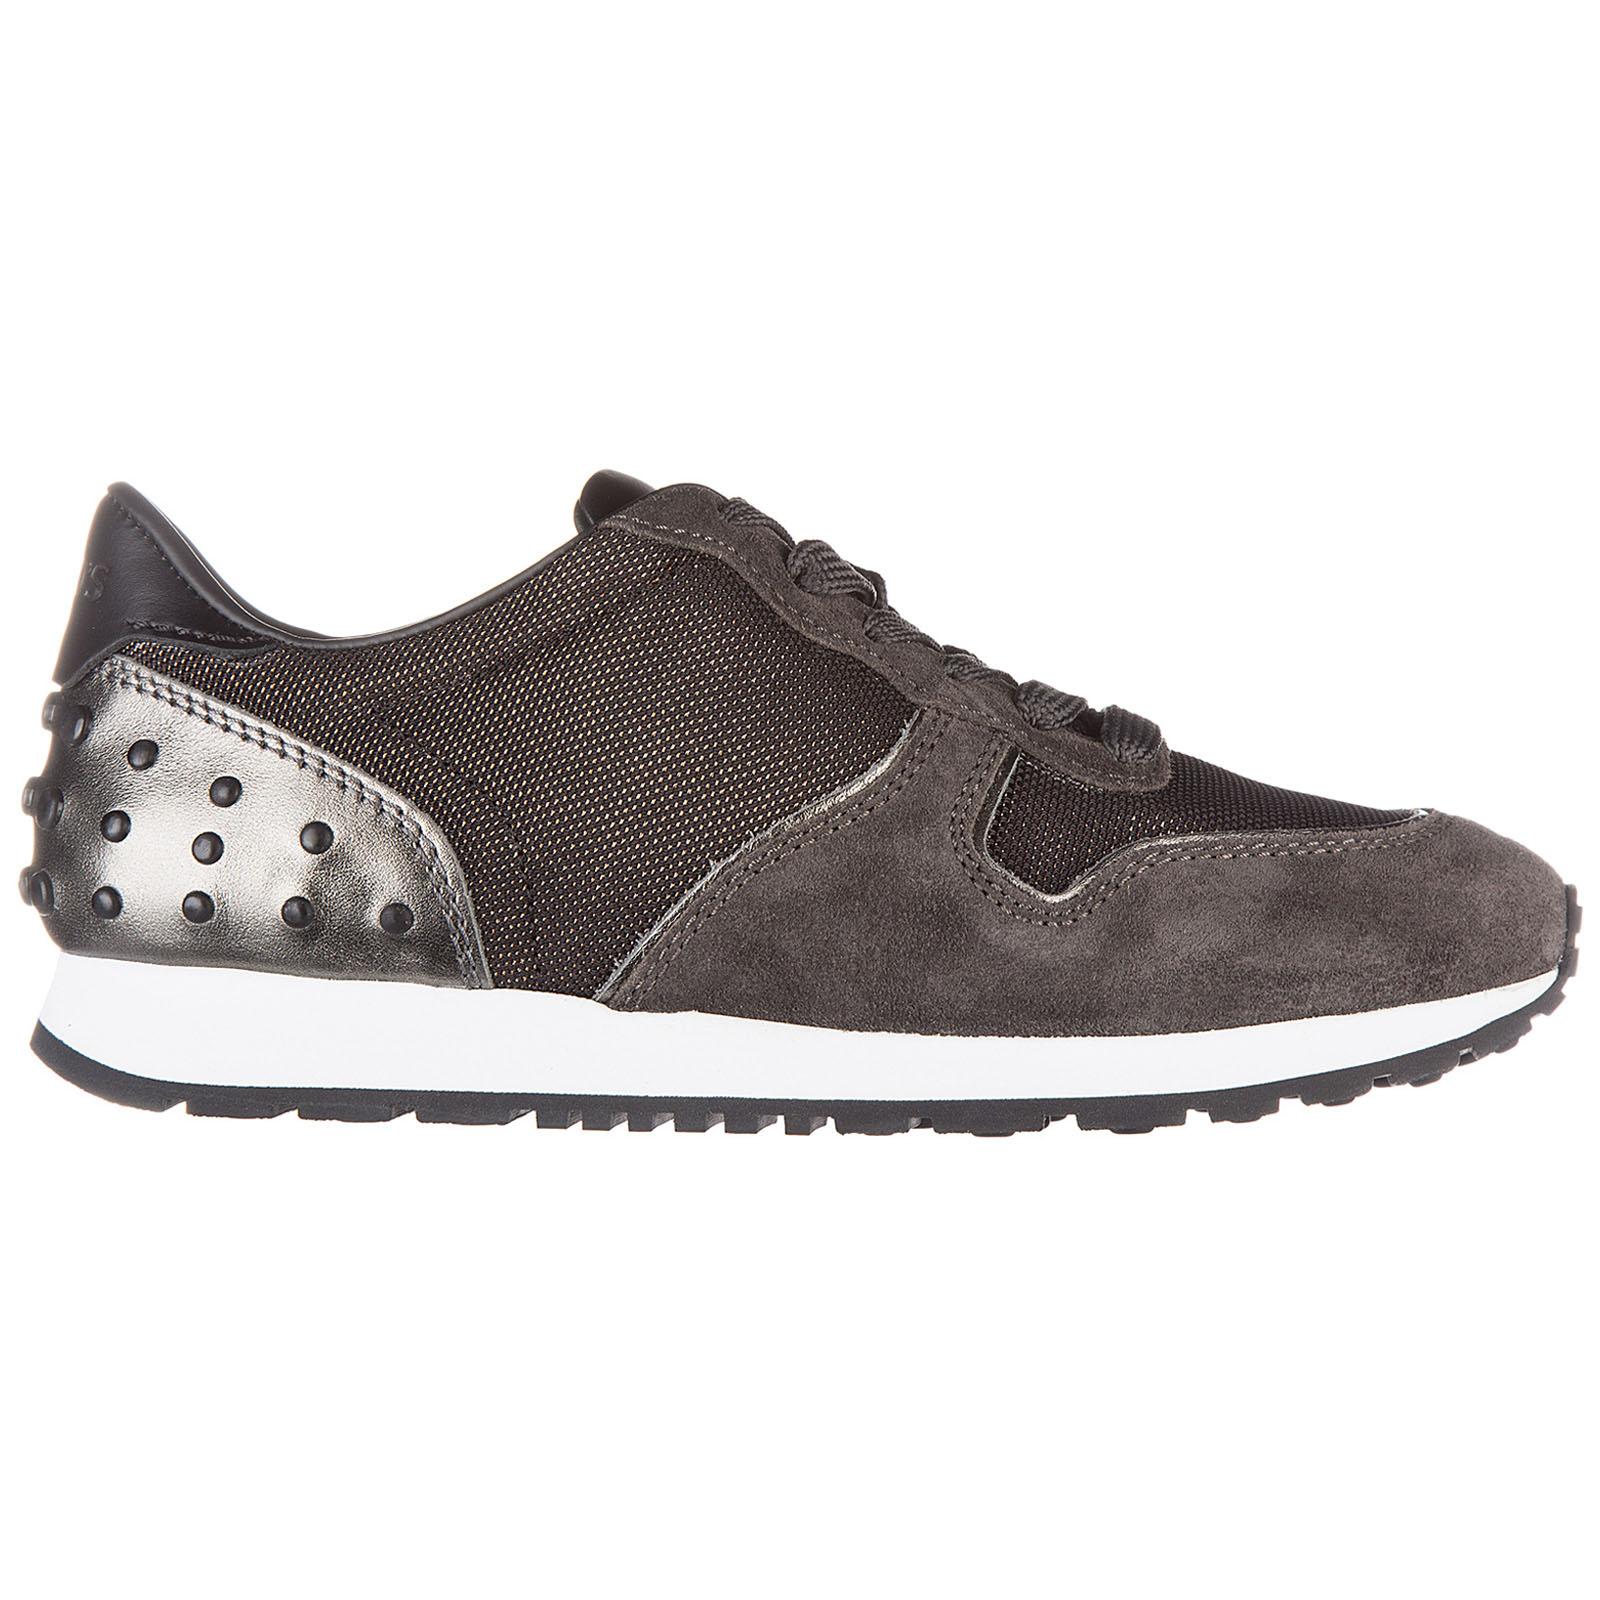 Zapatos zapatillas de deporte mujer en ante sportivo allacciata